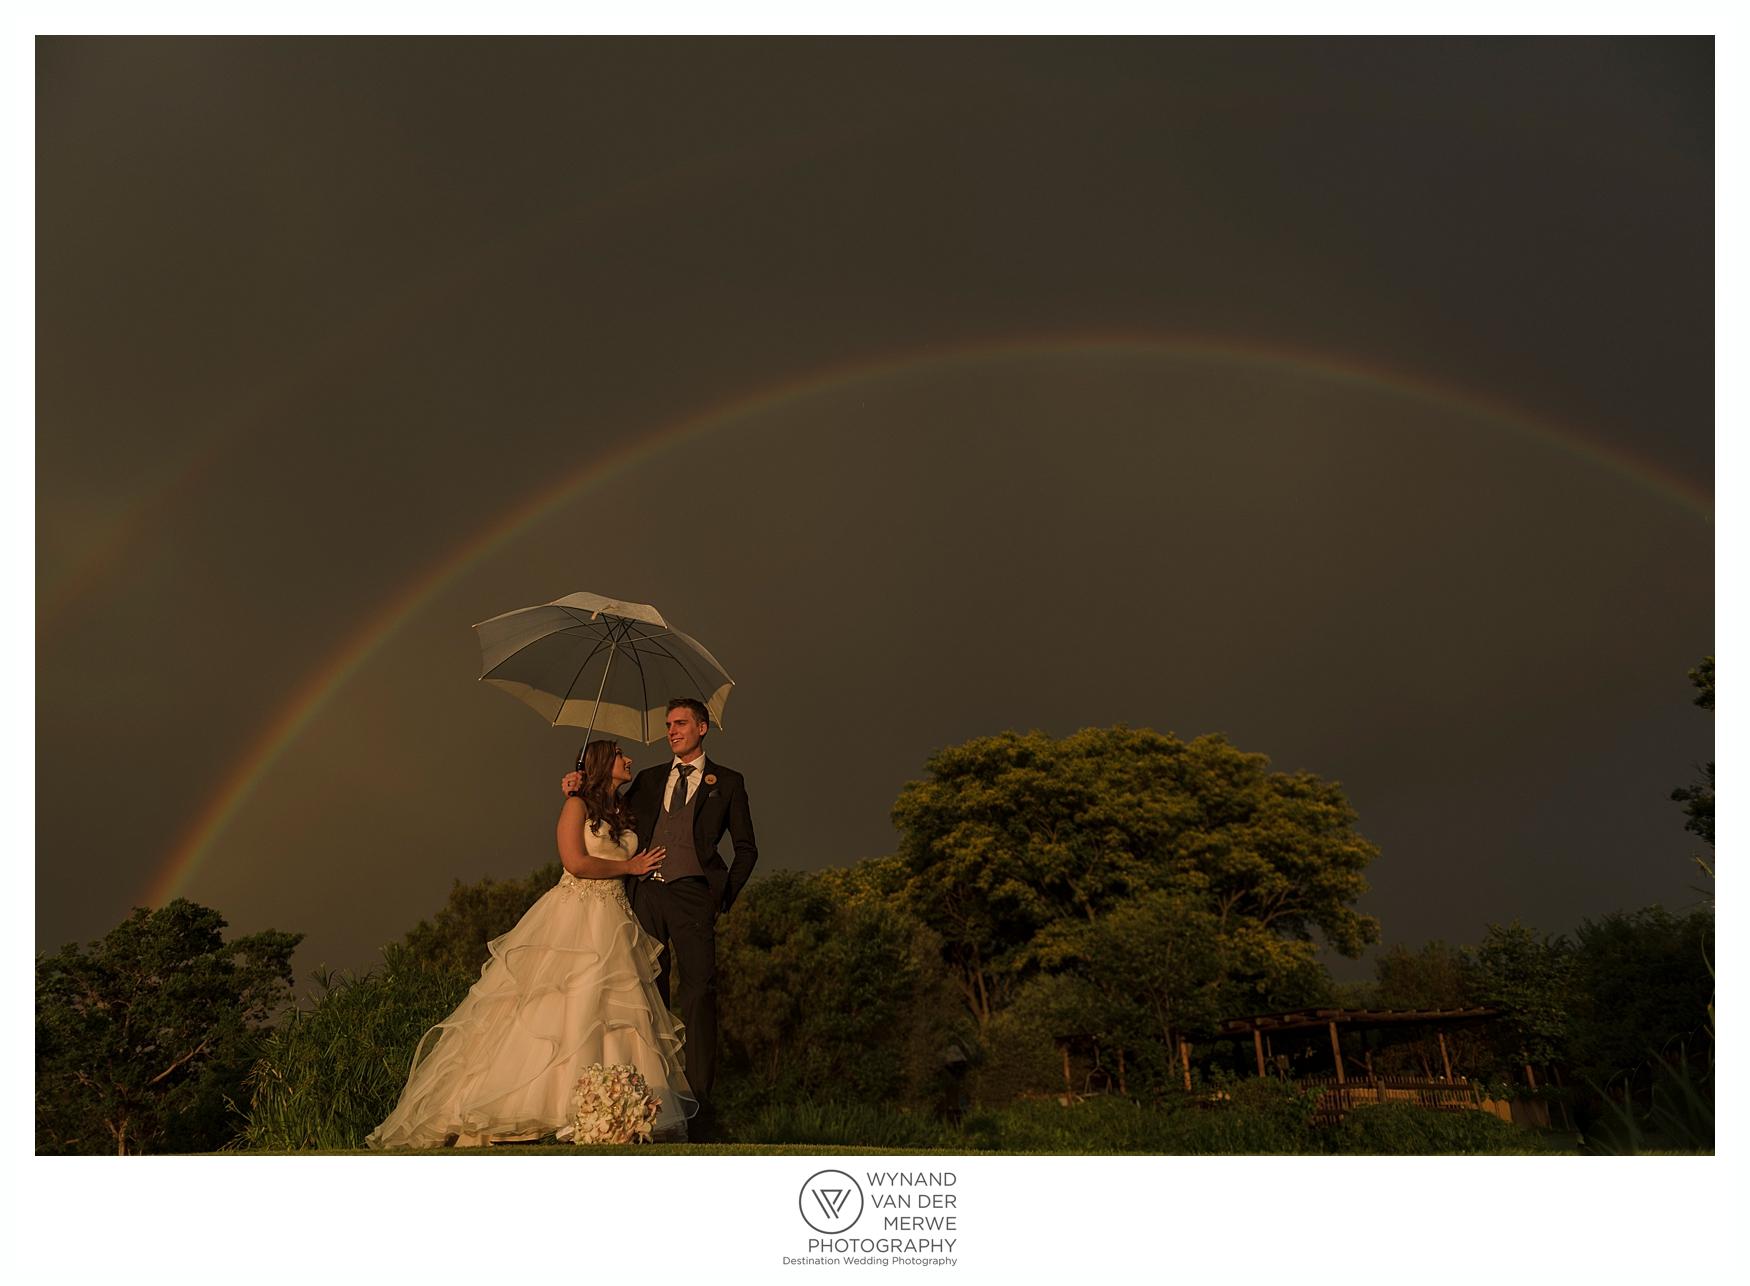 Wynandvandermerwe ryan natalia wedding photography cradle valley guesthouse gauteng-501.jpg